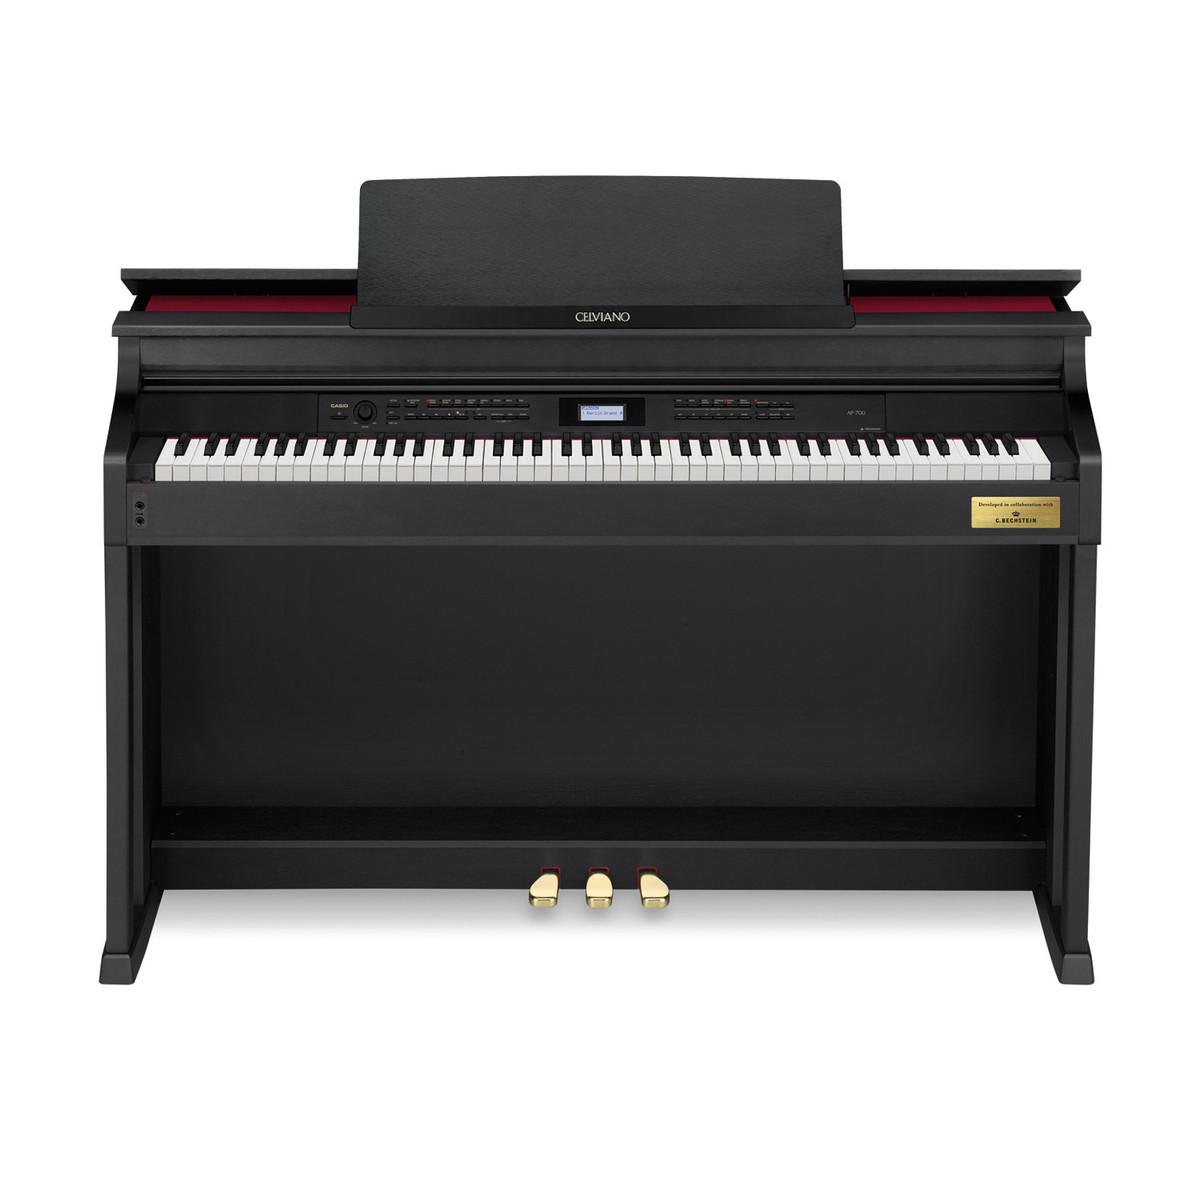 casio celviano ap 700 traditional digital piano satin black at. Black Bedroom Furniture Sets. Home Design Ideas